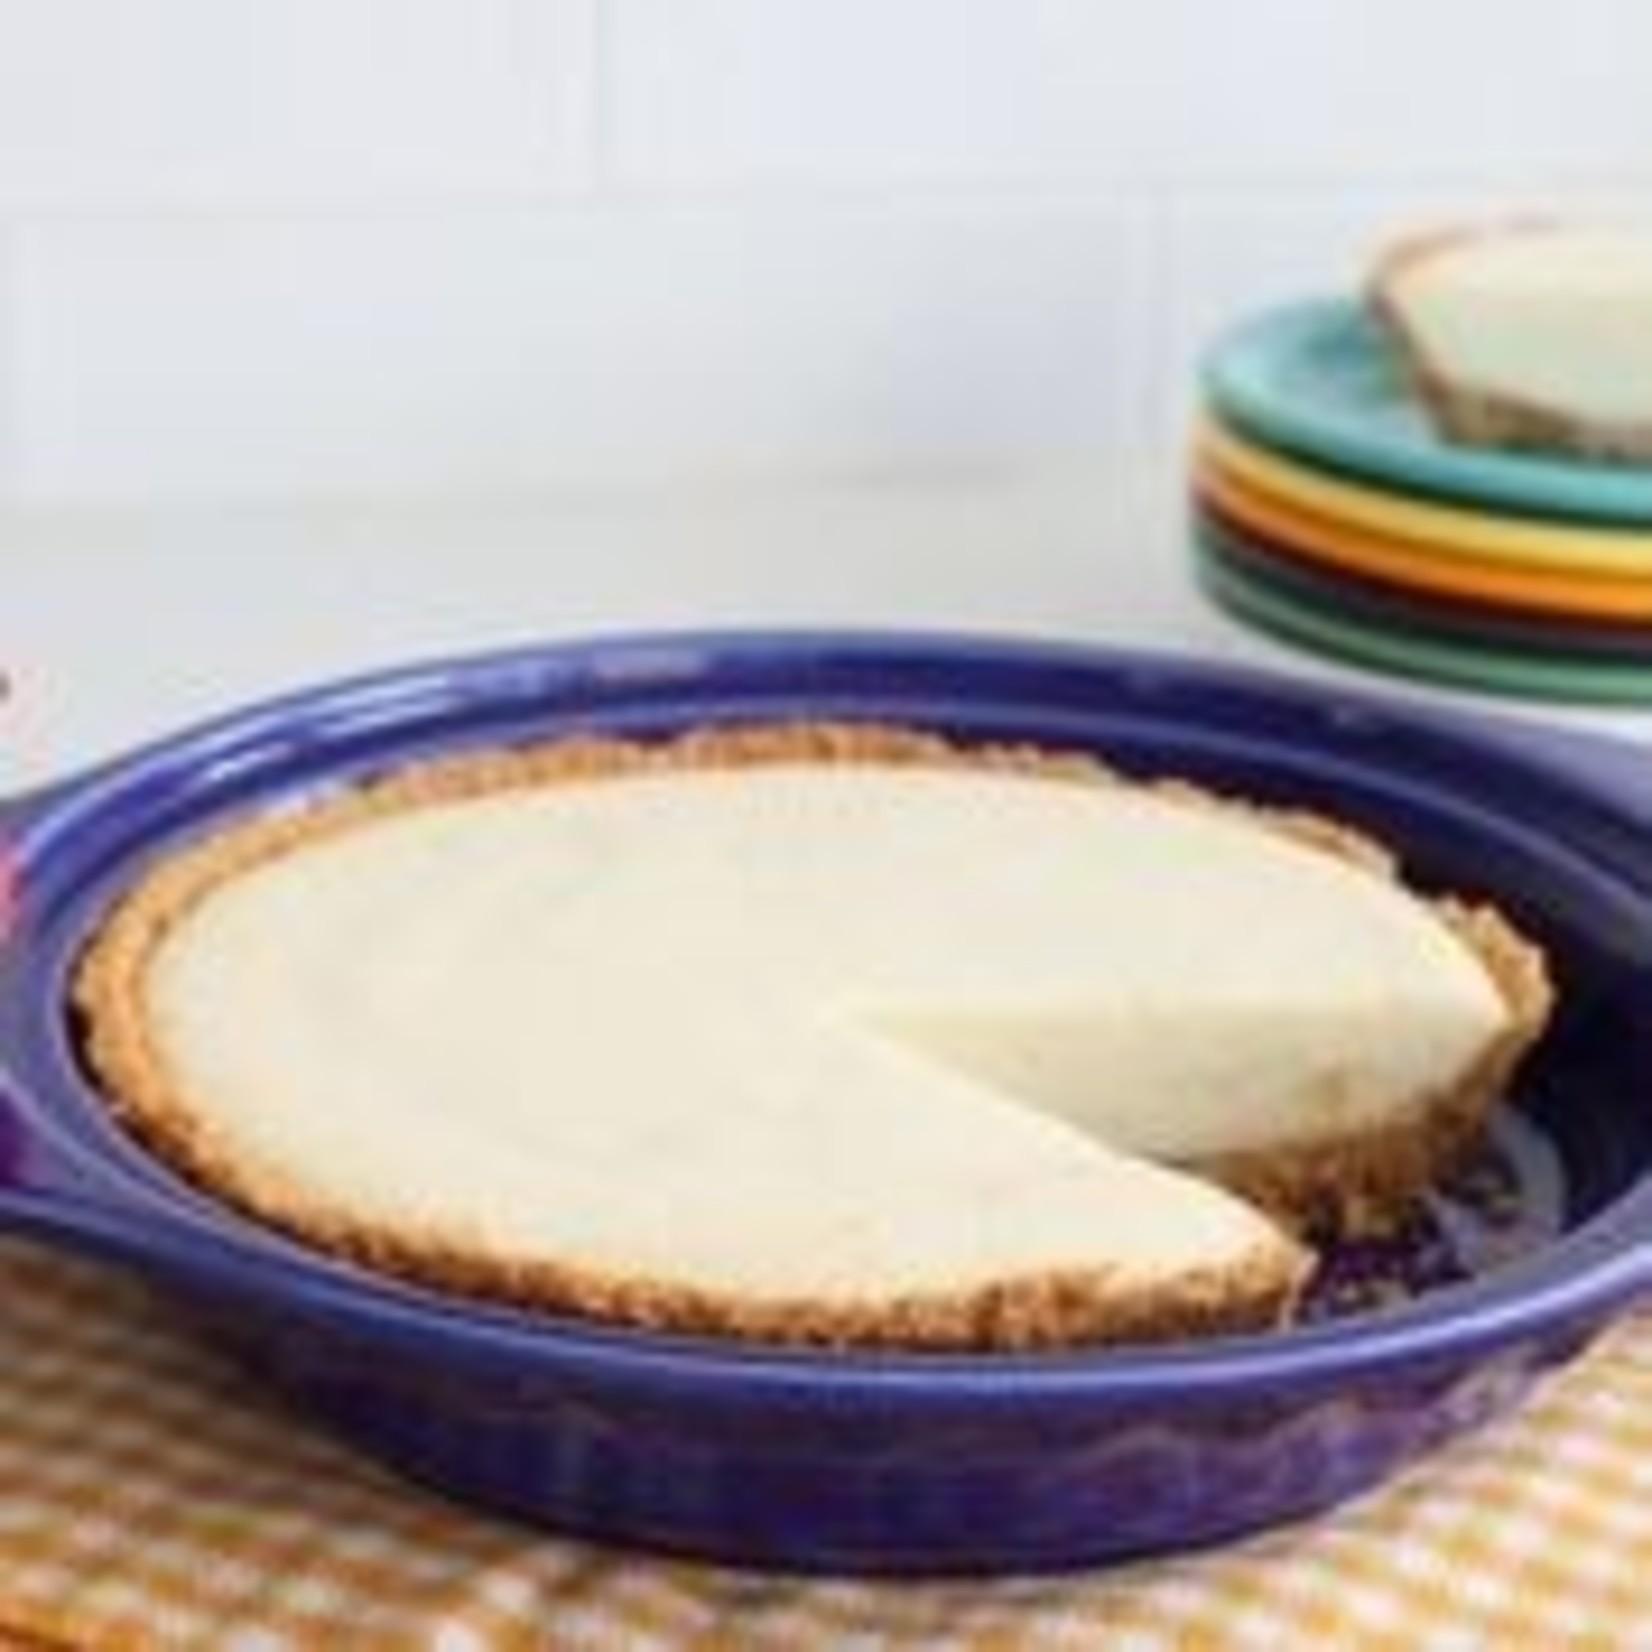 Nora Fleming Serveware Nora Fleming Deep Dish Fiestaware Pie Plate with Handles and Scarlett  Pitcher Mini